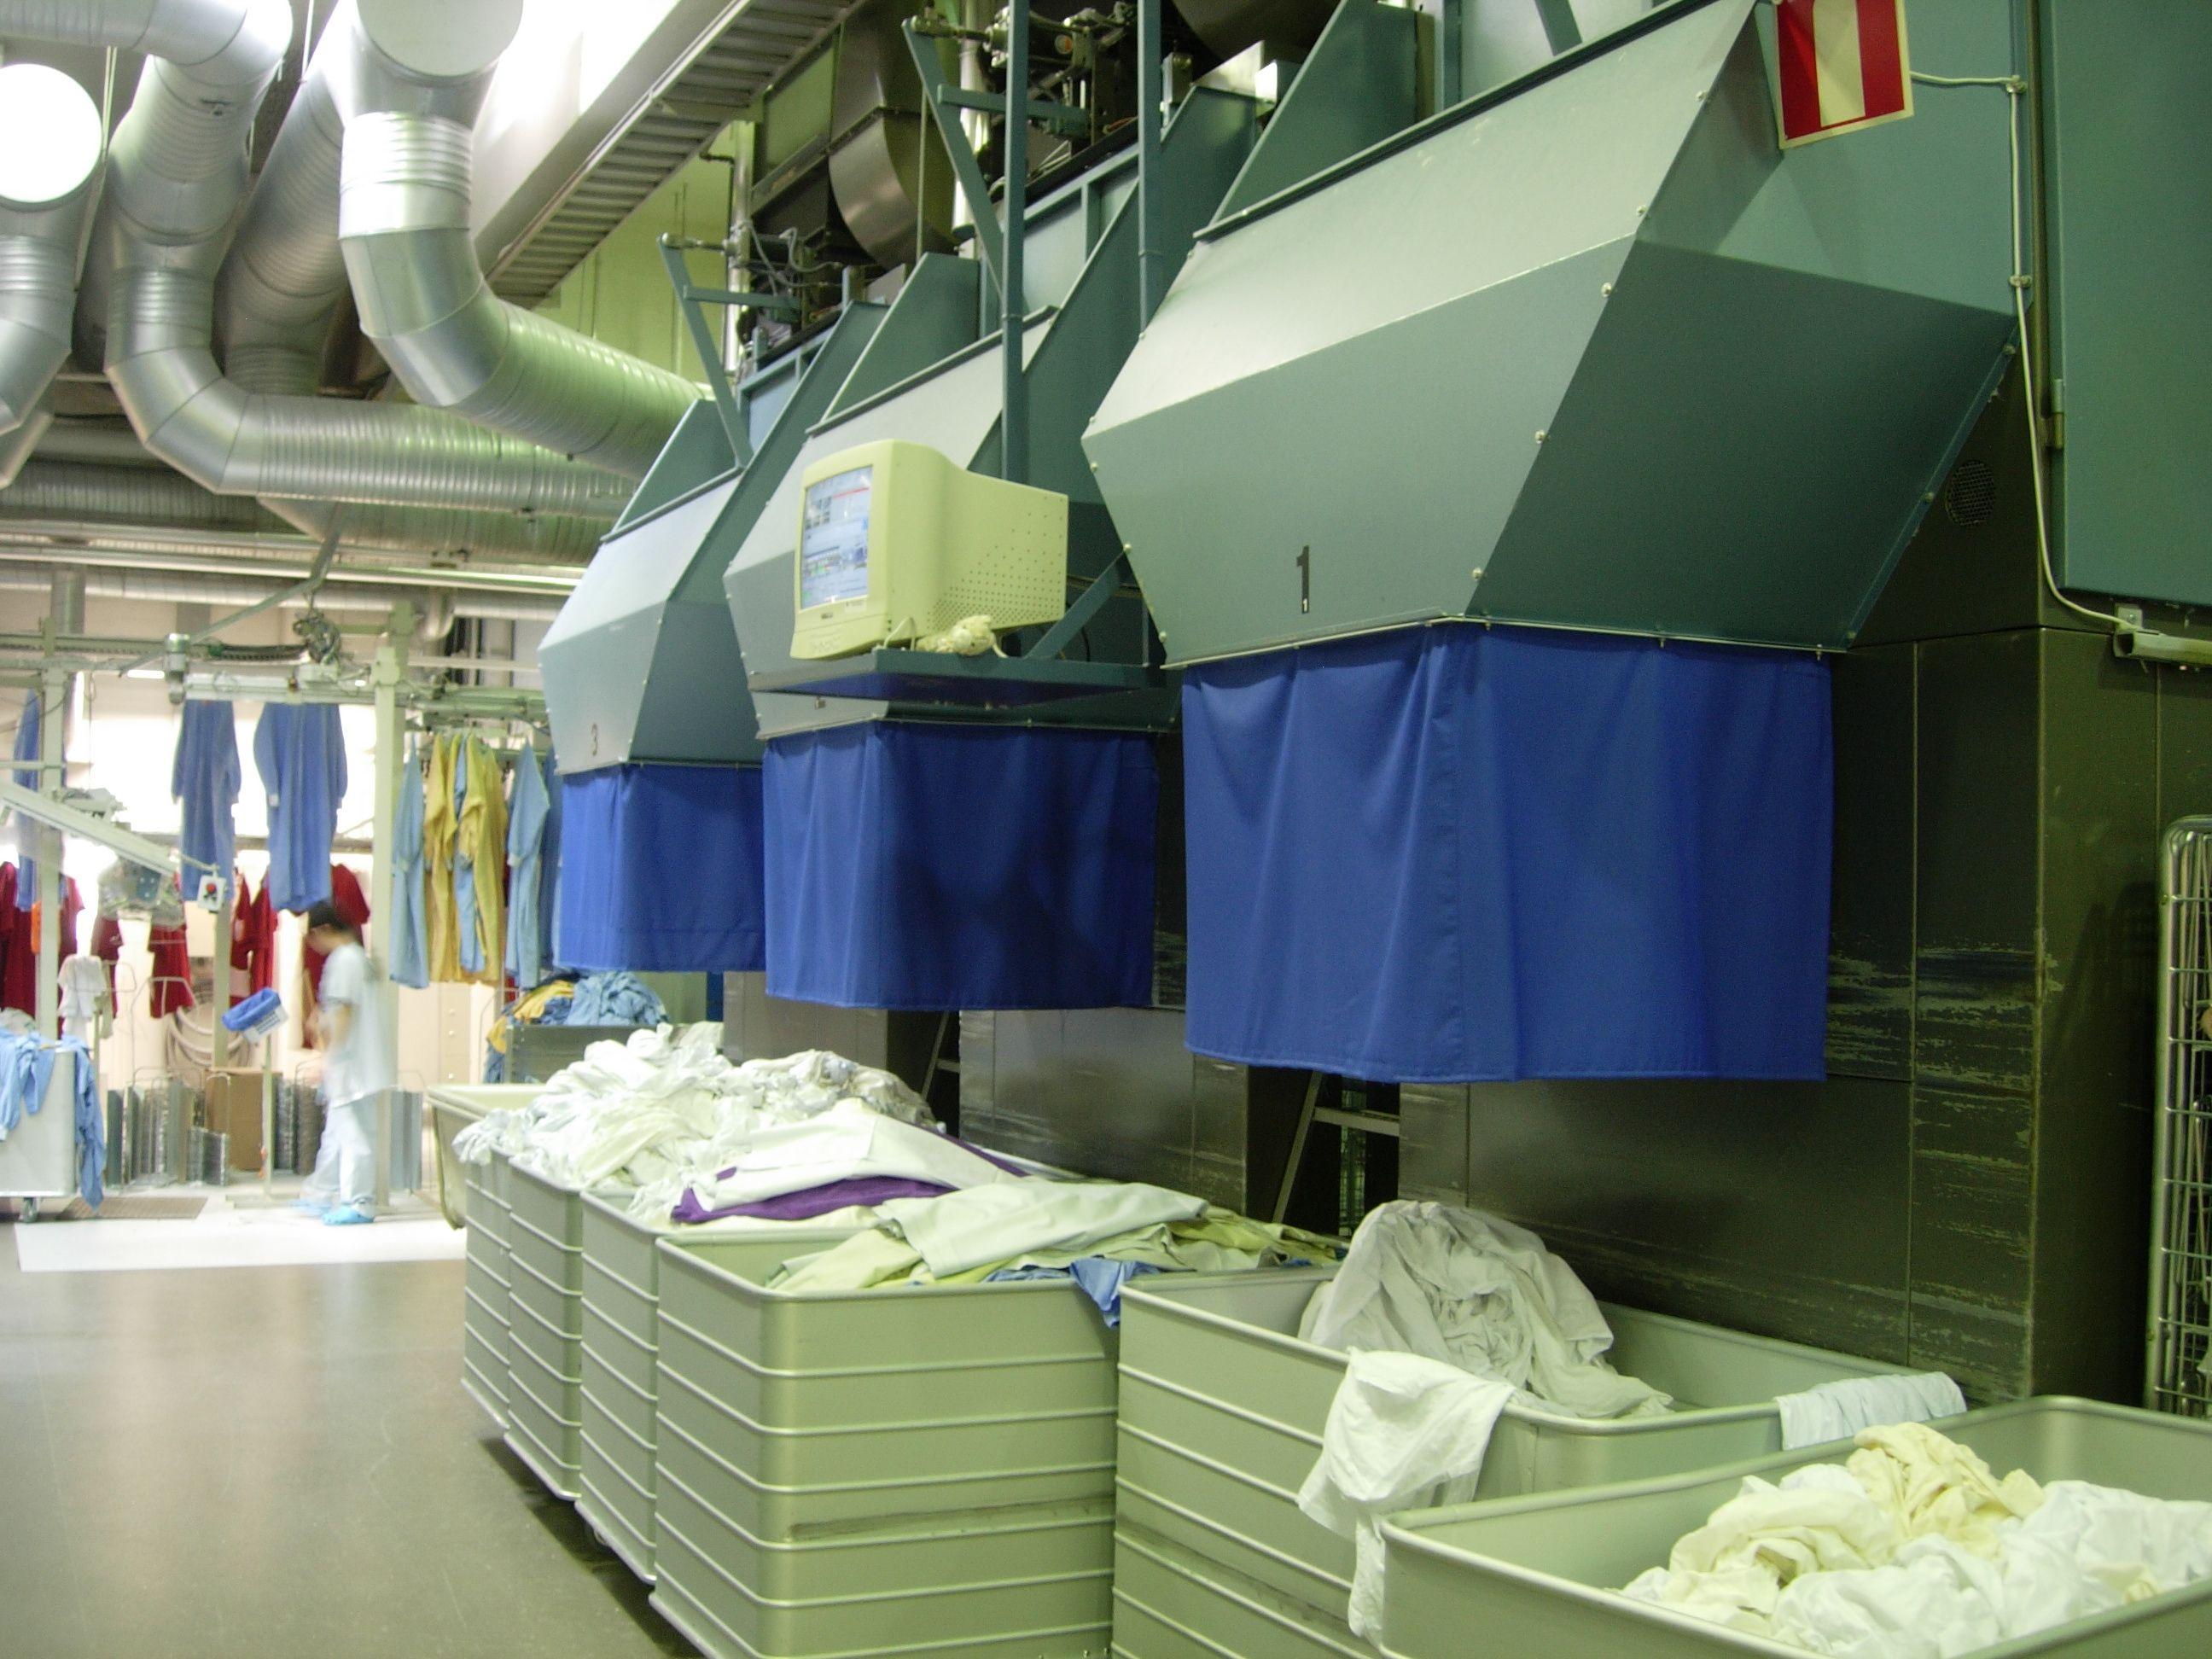 3c3a71bf20ea96a7d39bf409a6b52ac5 - Washing Machine Repair Dubai Discovery Gardens